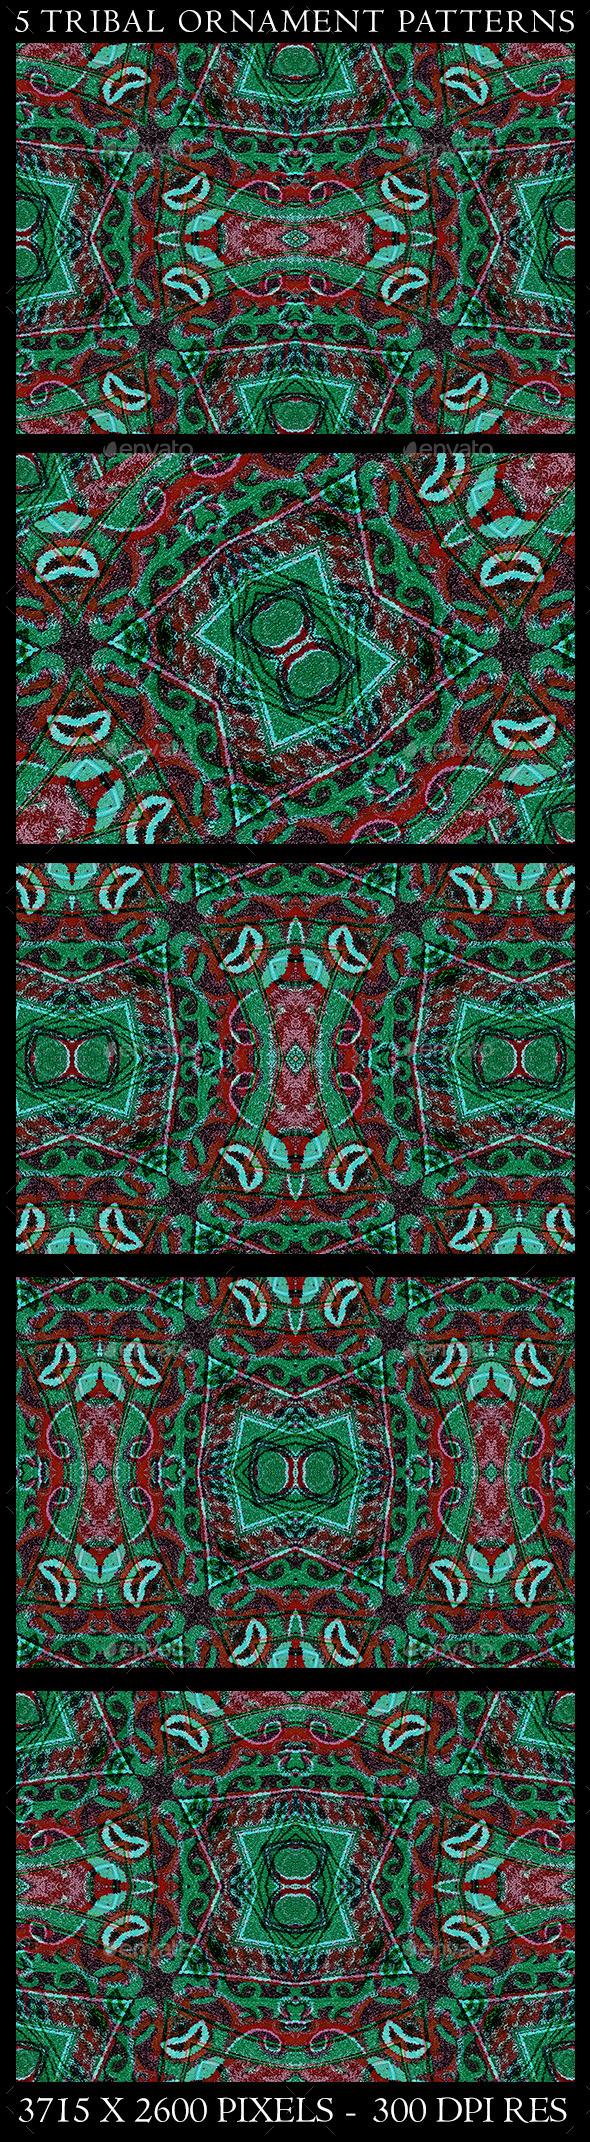 5 Tribal Ornament Patterns - Patterns Decorative